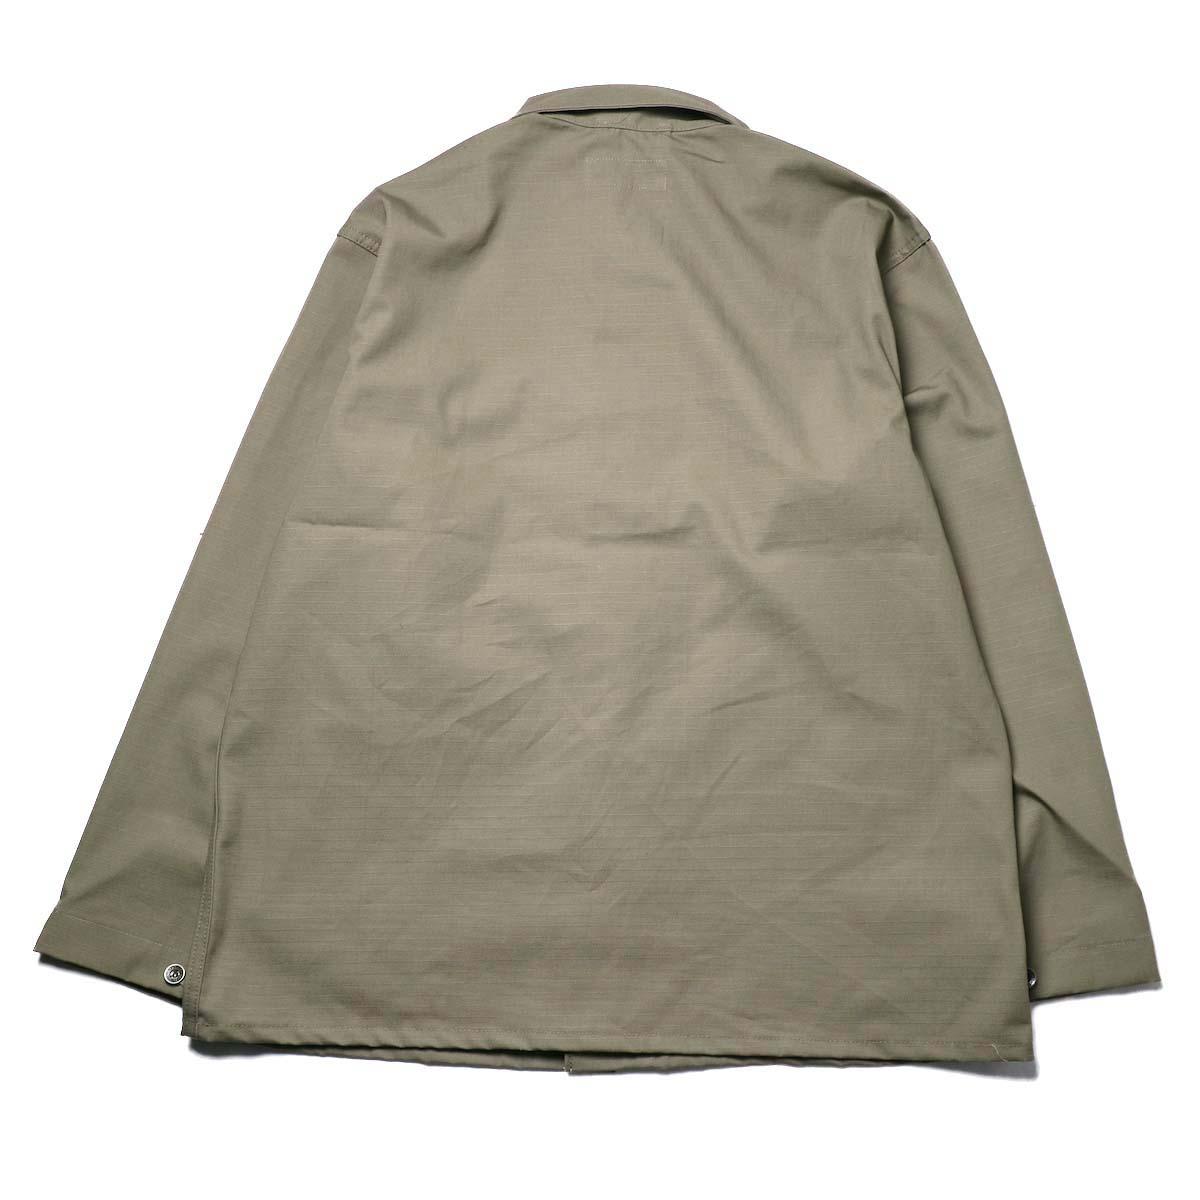 Engineered Garments Workaday / Utility Jacket - Cotton Ripstop (Khaki)背面